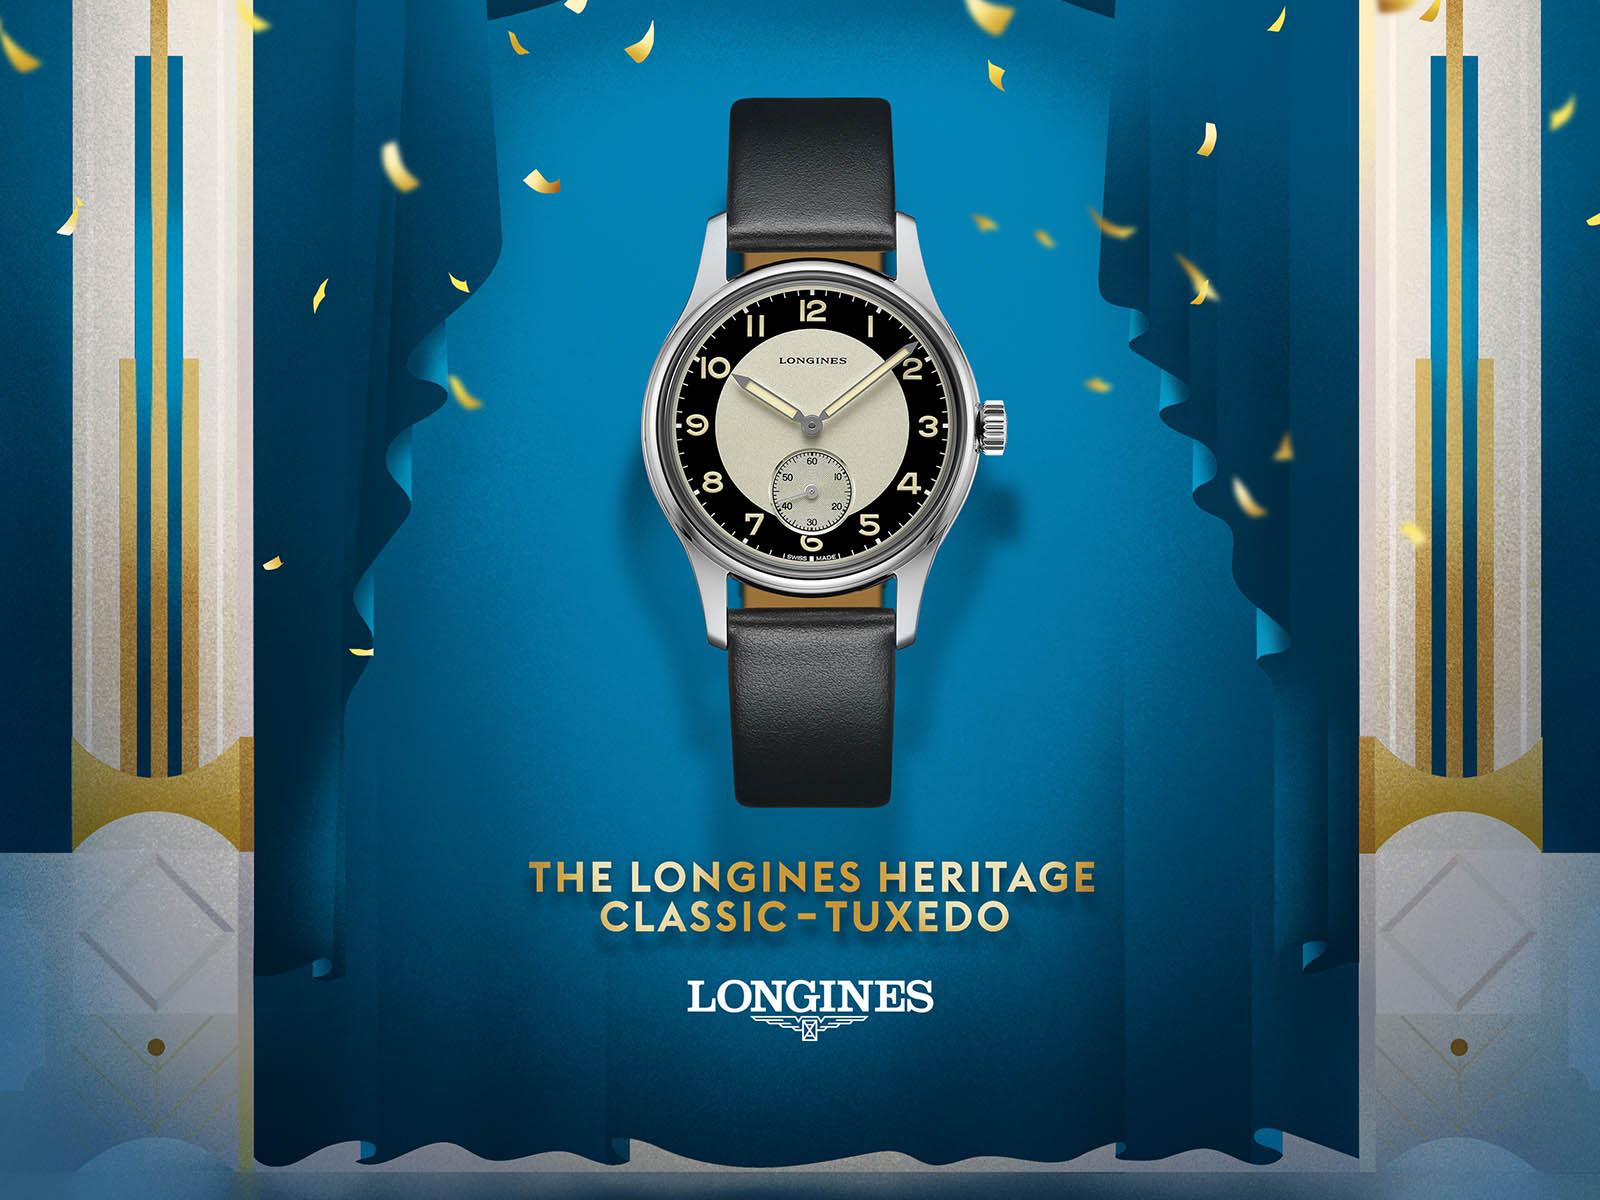 l2-330-4-93-0-longines-heritage-classic-tuxedo-3.jpg